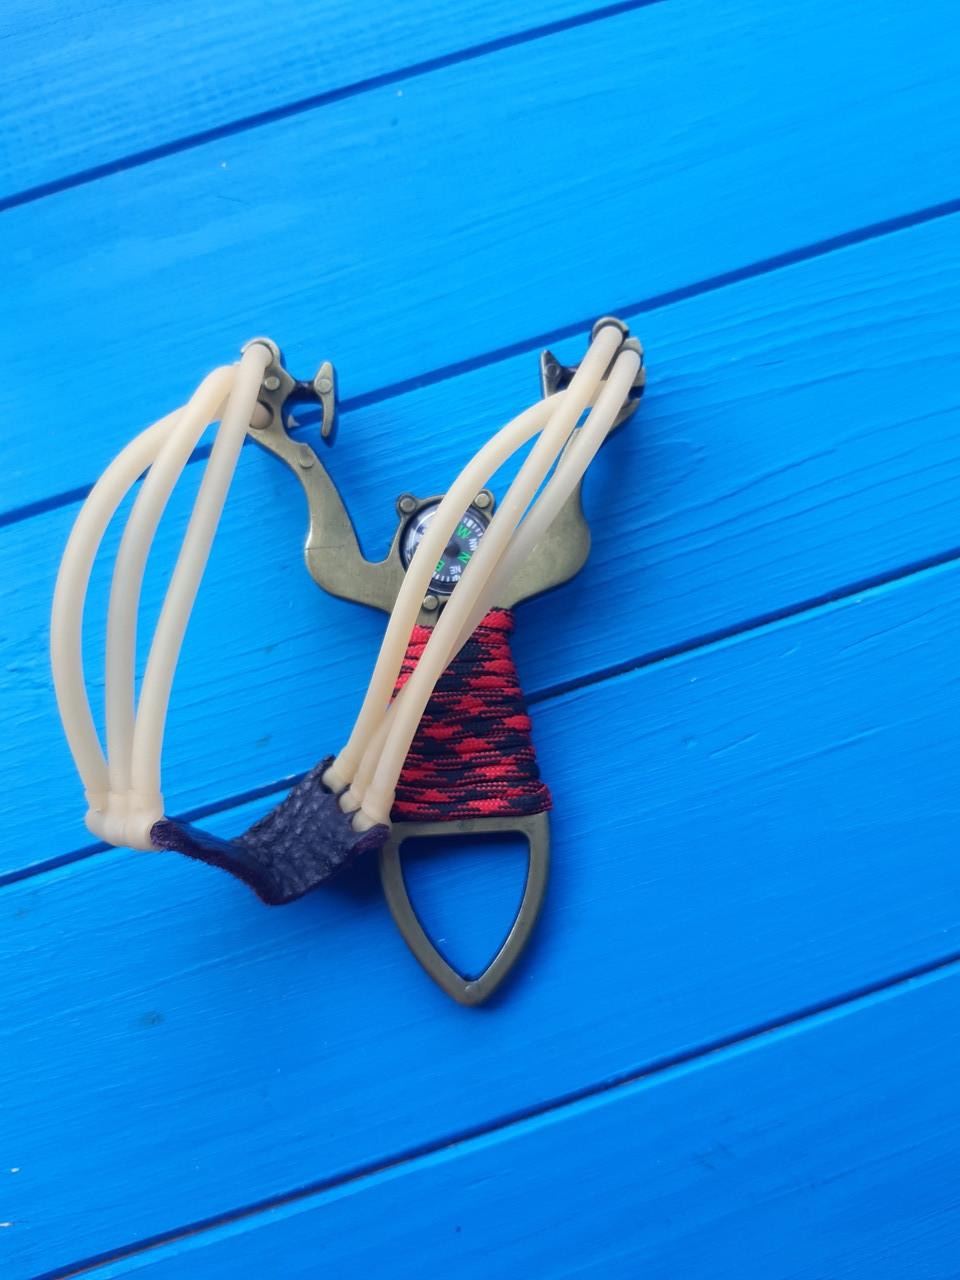 Стальная спортивная рогатка  стройным жгутом +компас